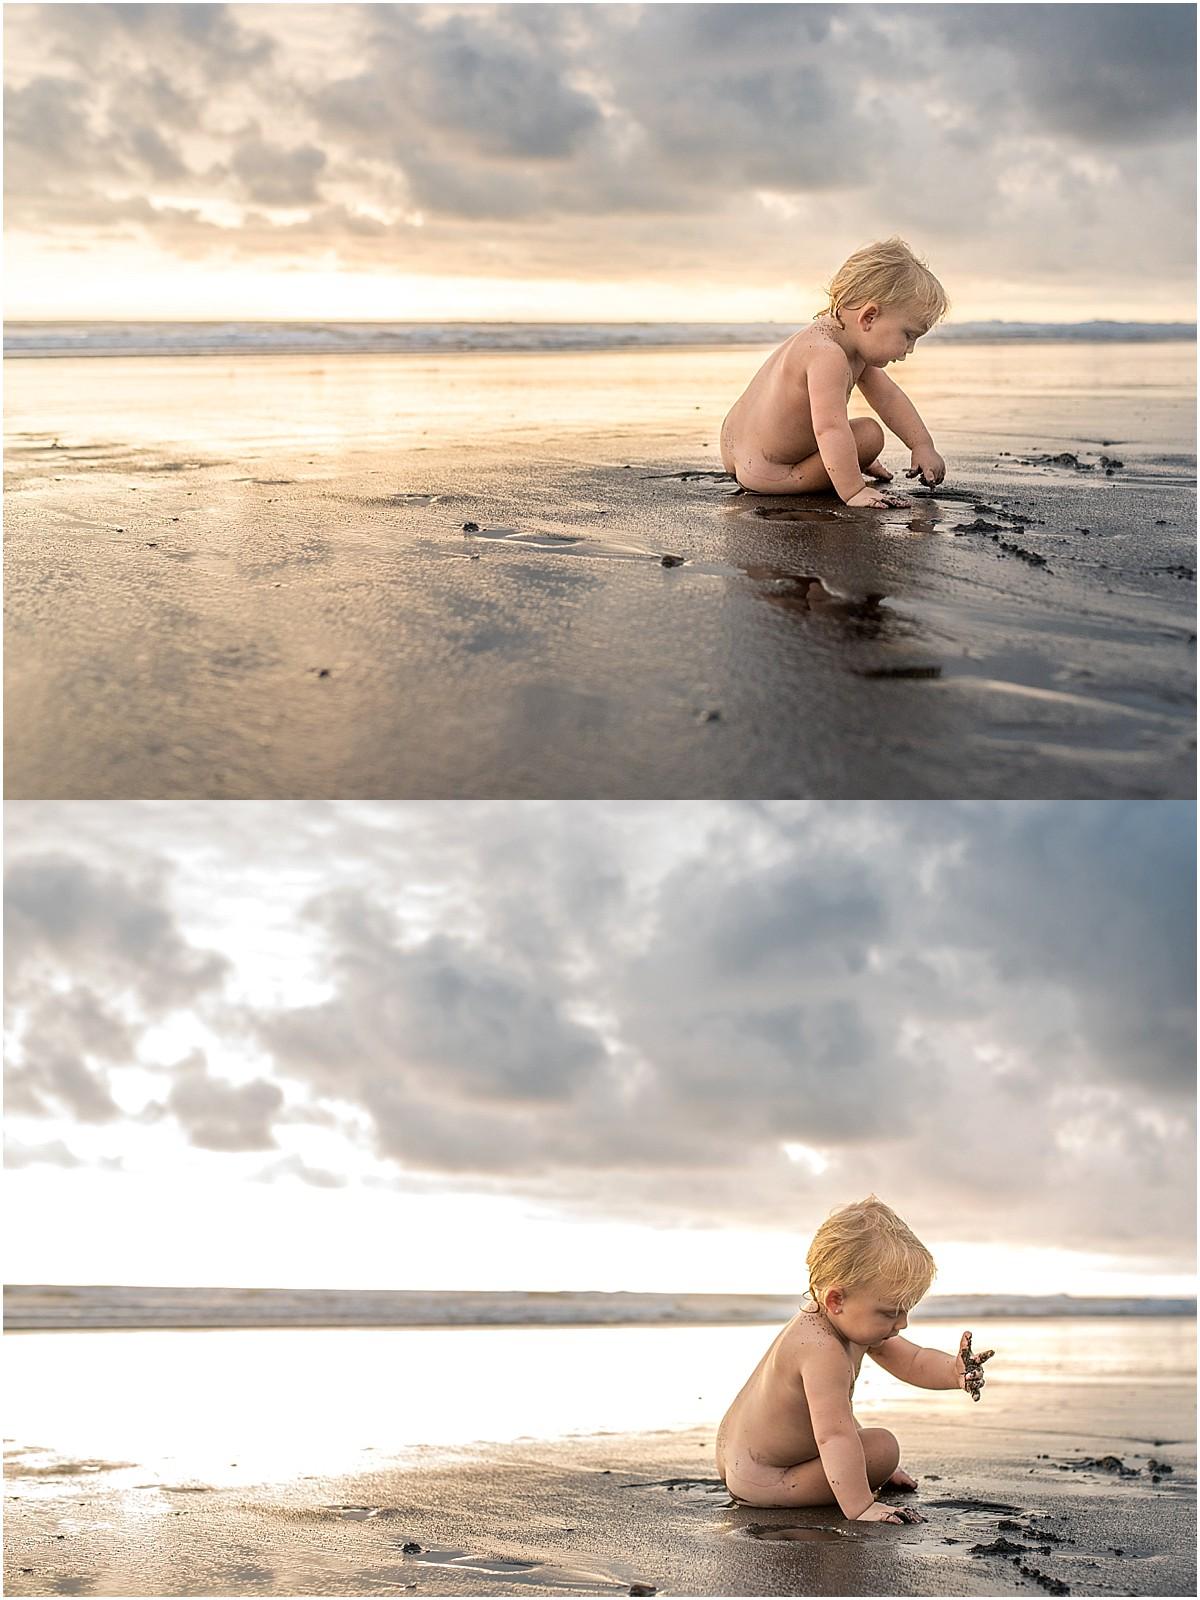 Ashley_Rogers_Photography_South_Florida_Photographer_Orlando_Photographer_Costa_Rica_Photographer_1621.jpg